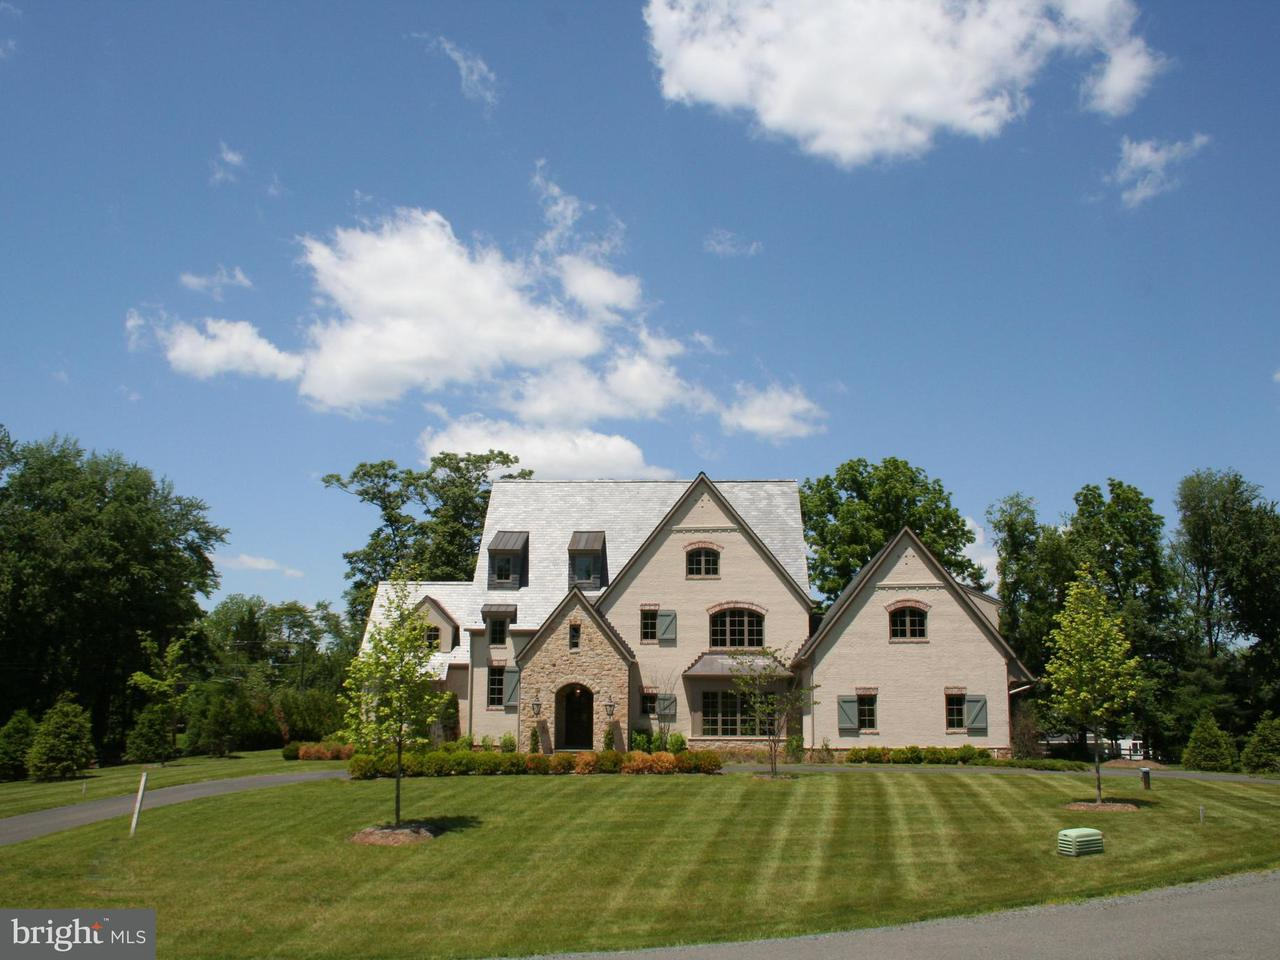 Single Family Home for Sale at 11326 Fox Creek Farm Way 11326 Fox Creek Farm Way Great Falls, Virginia 22066 United States